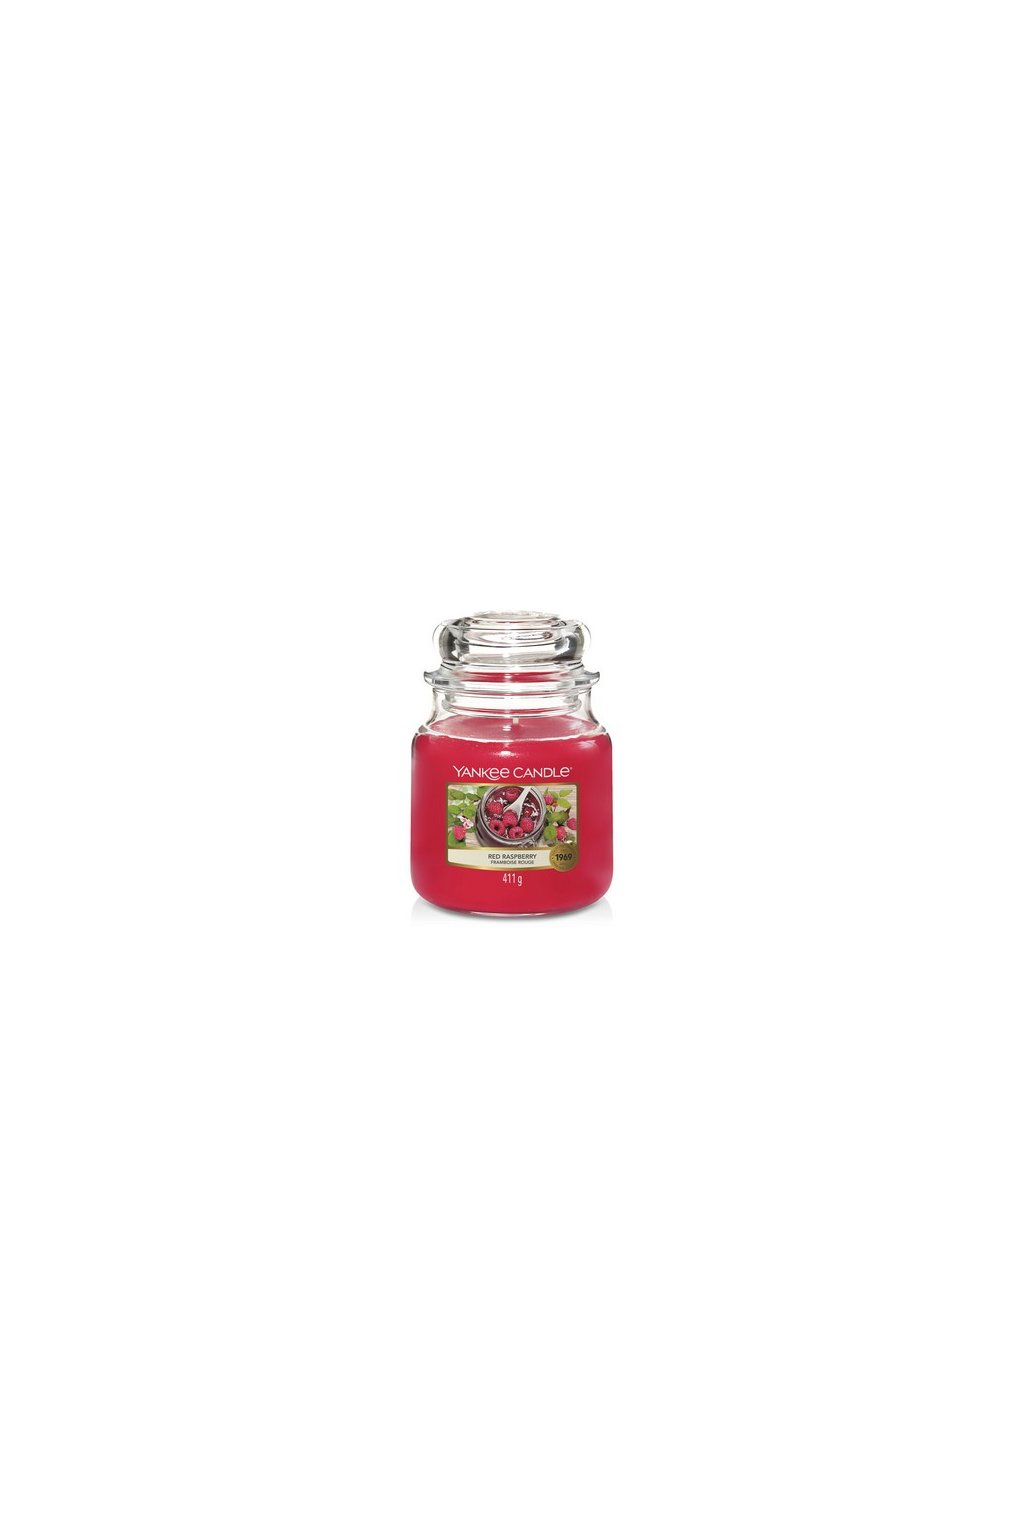 YANKEE CANDLE RED RASPBERRY 411g